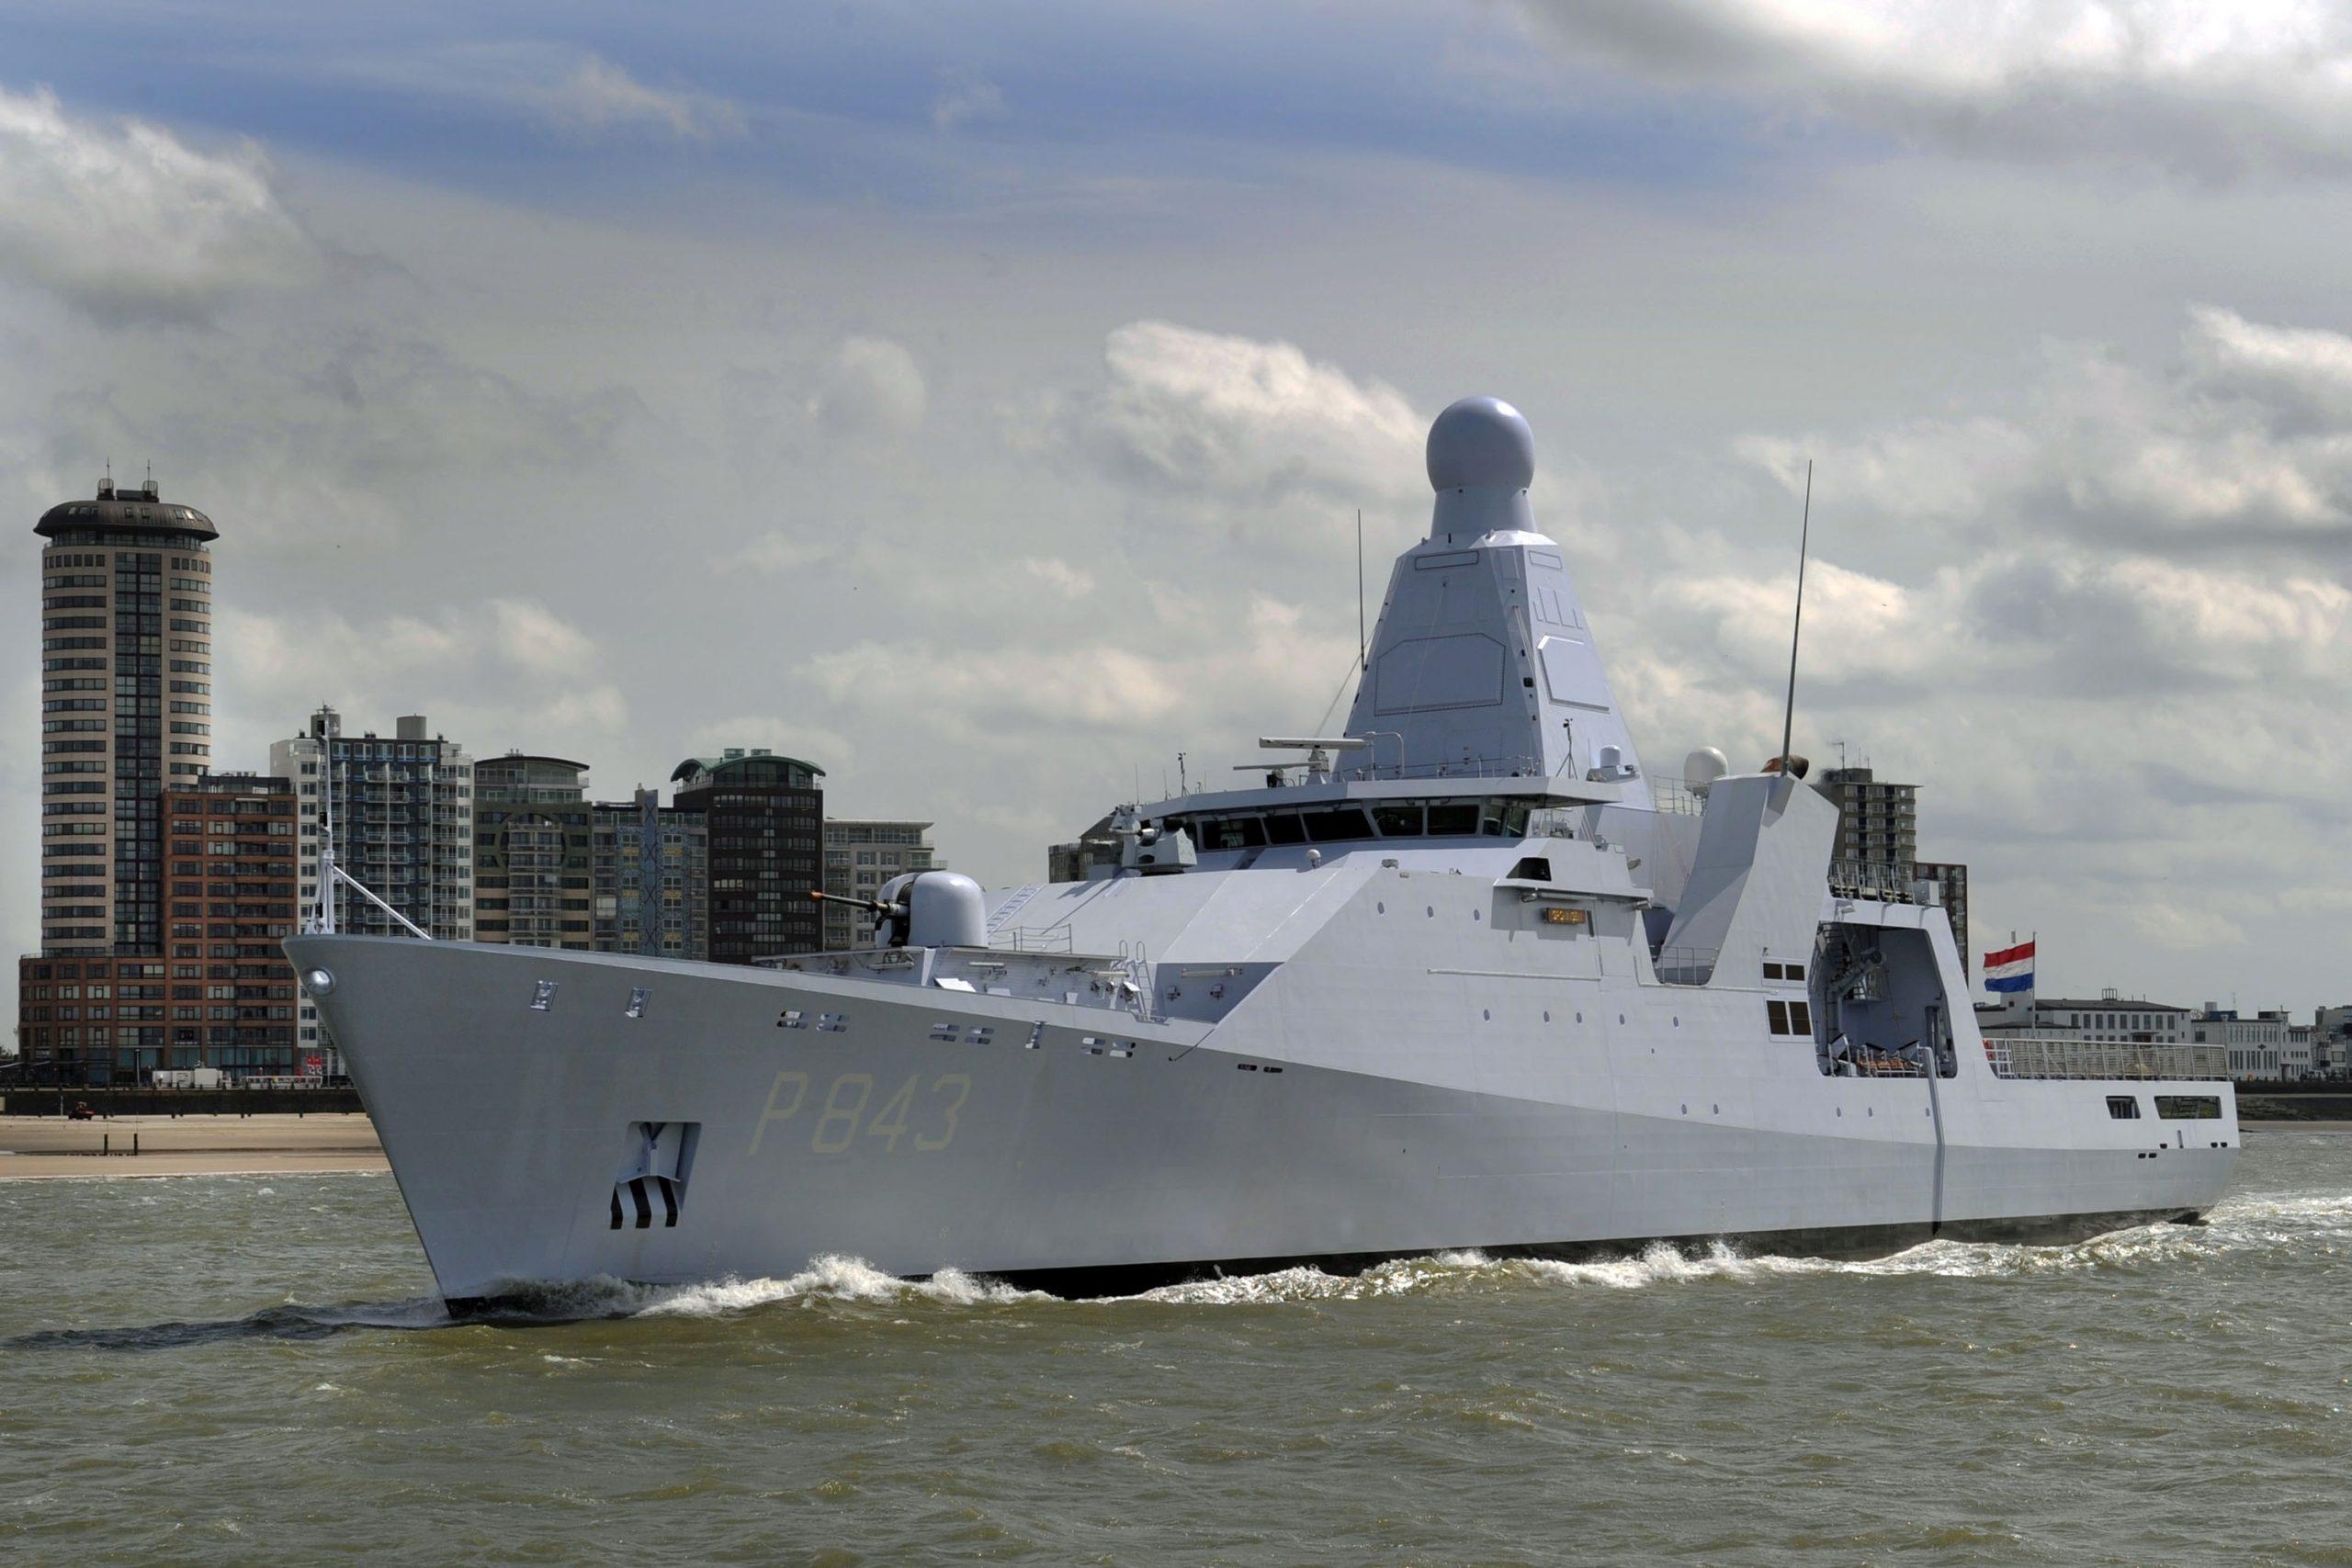 Royal IHC to repair Dutch navy's patrol vessel Groningen